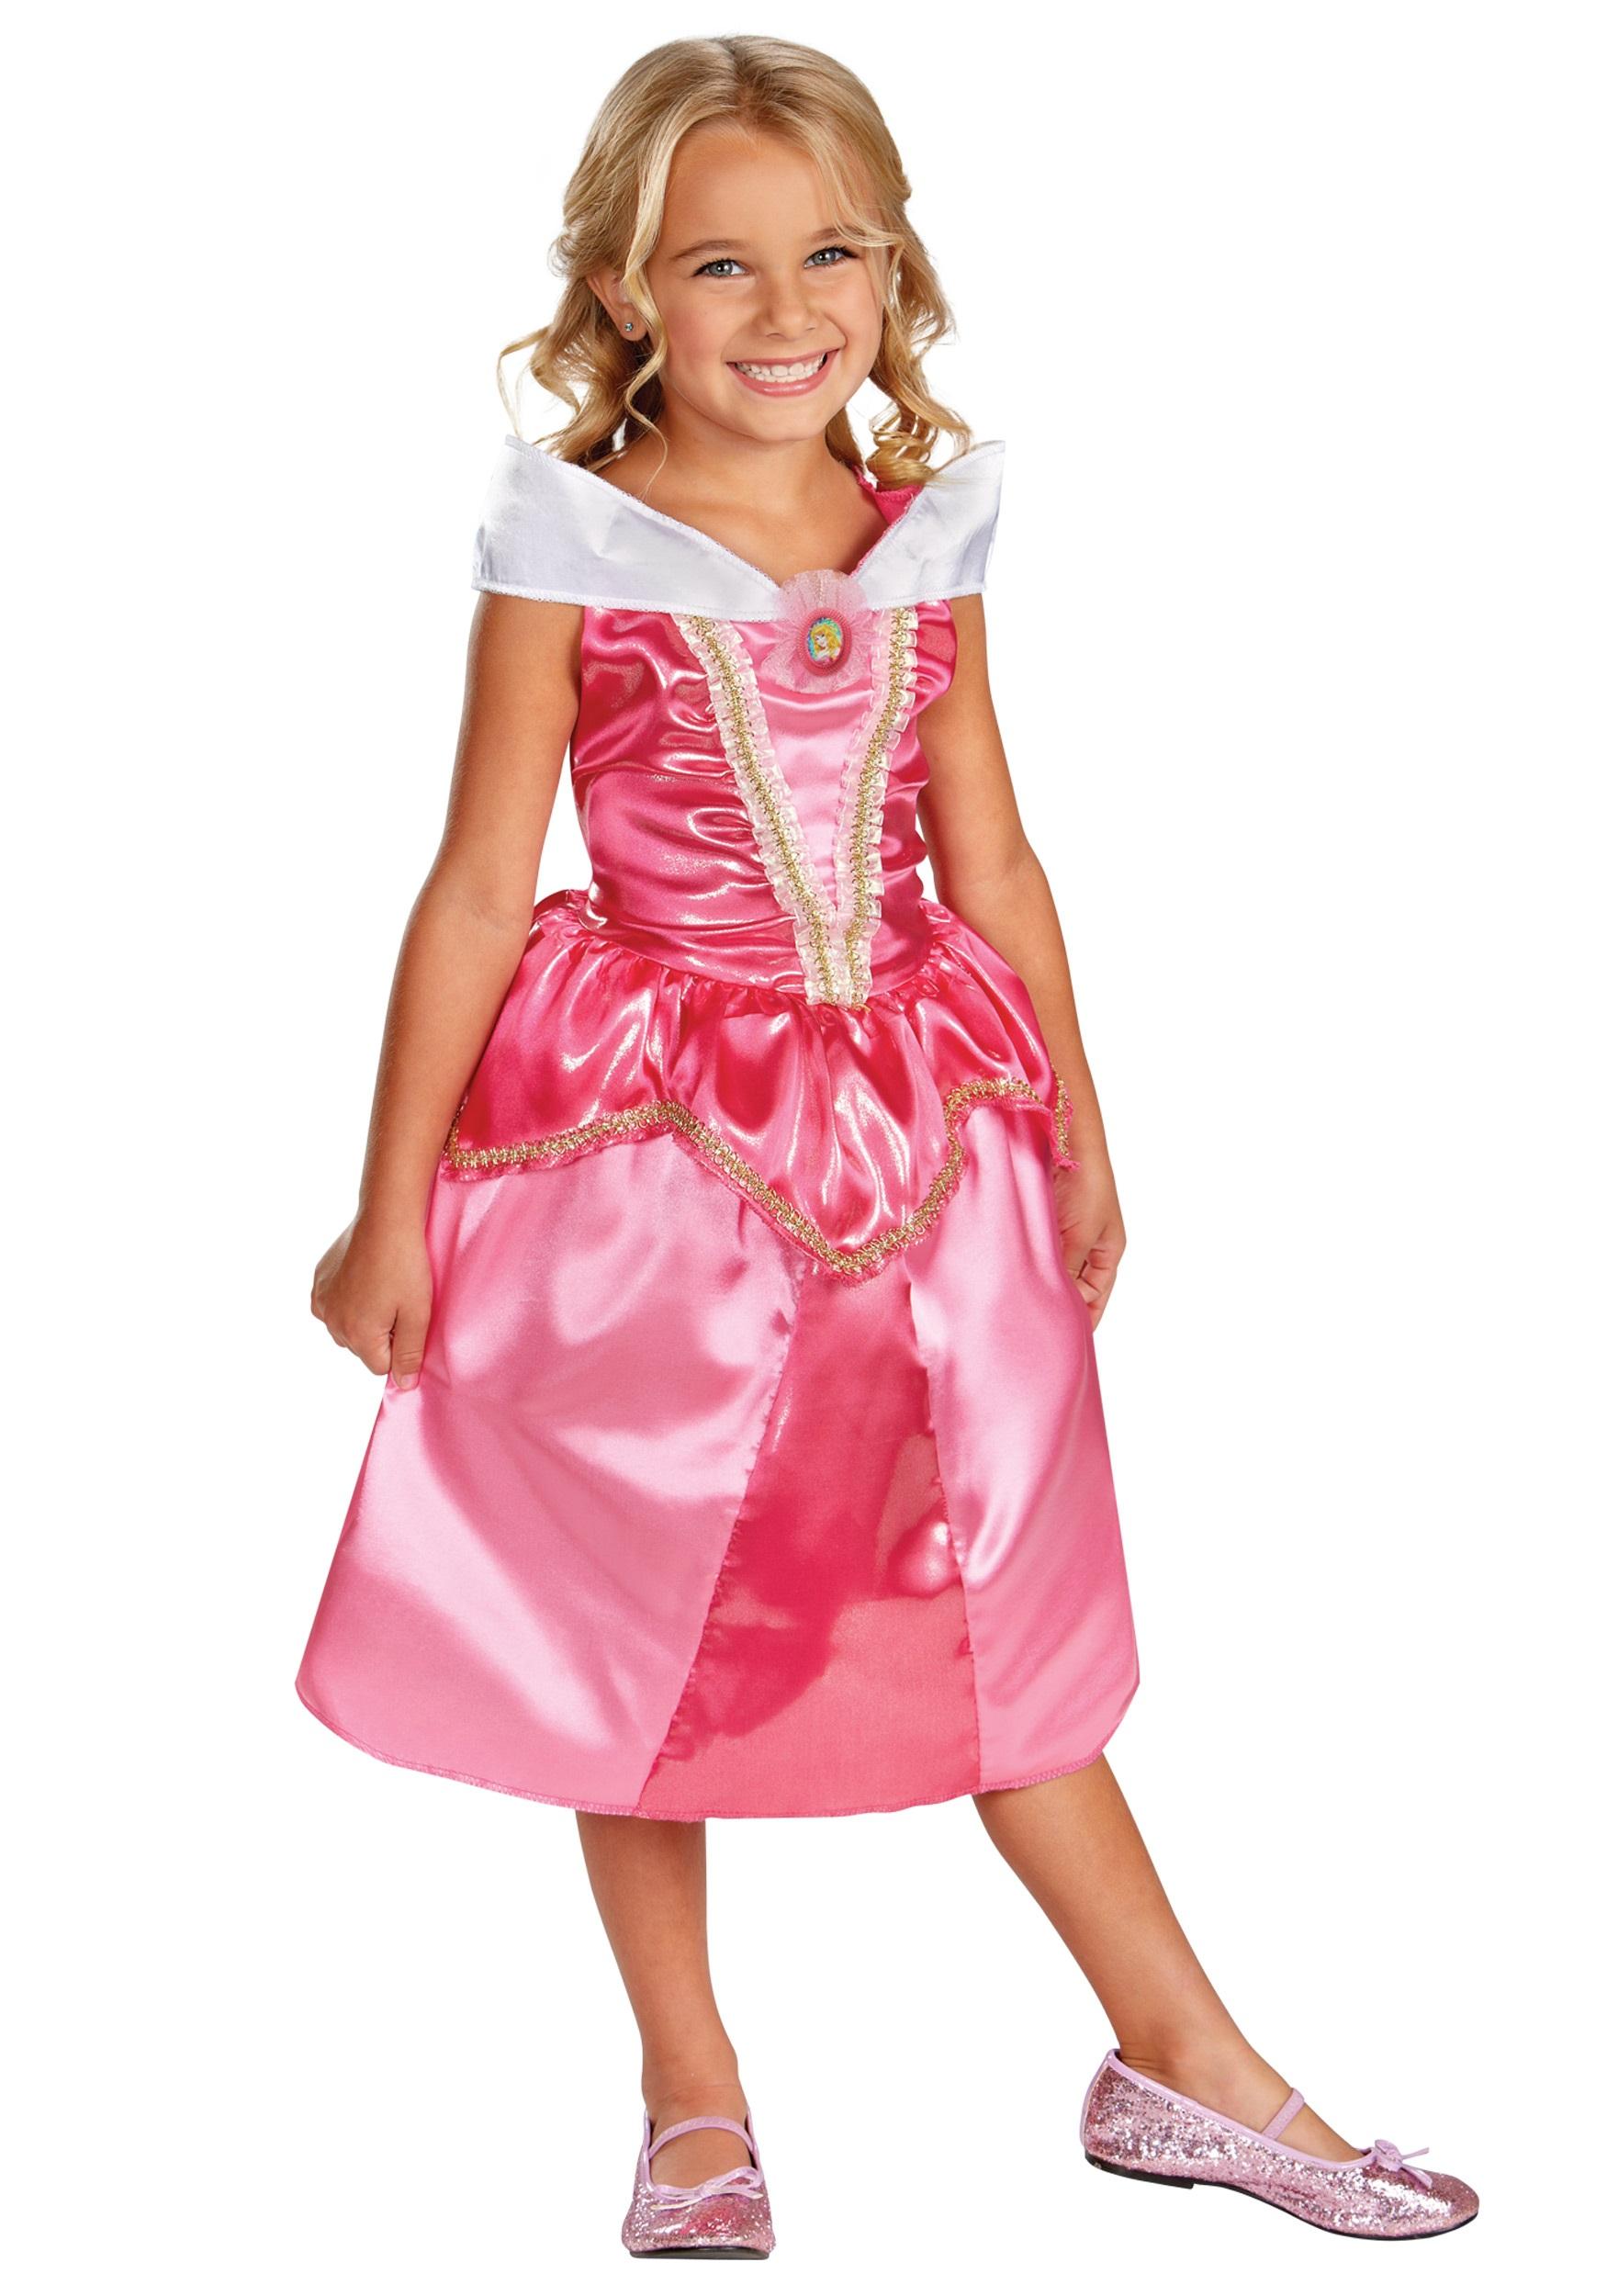 Girls Aurora Sparkle Classic Costume  sc 1 st  Halloween Costumes & Girls Aurora Sparkle Classic Costume - Halloween Costumes